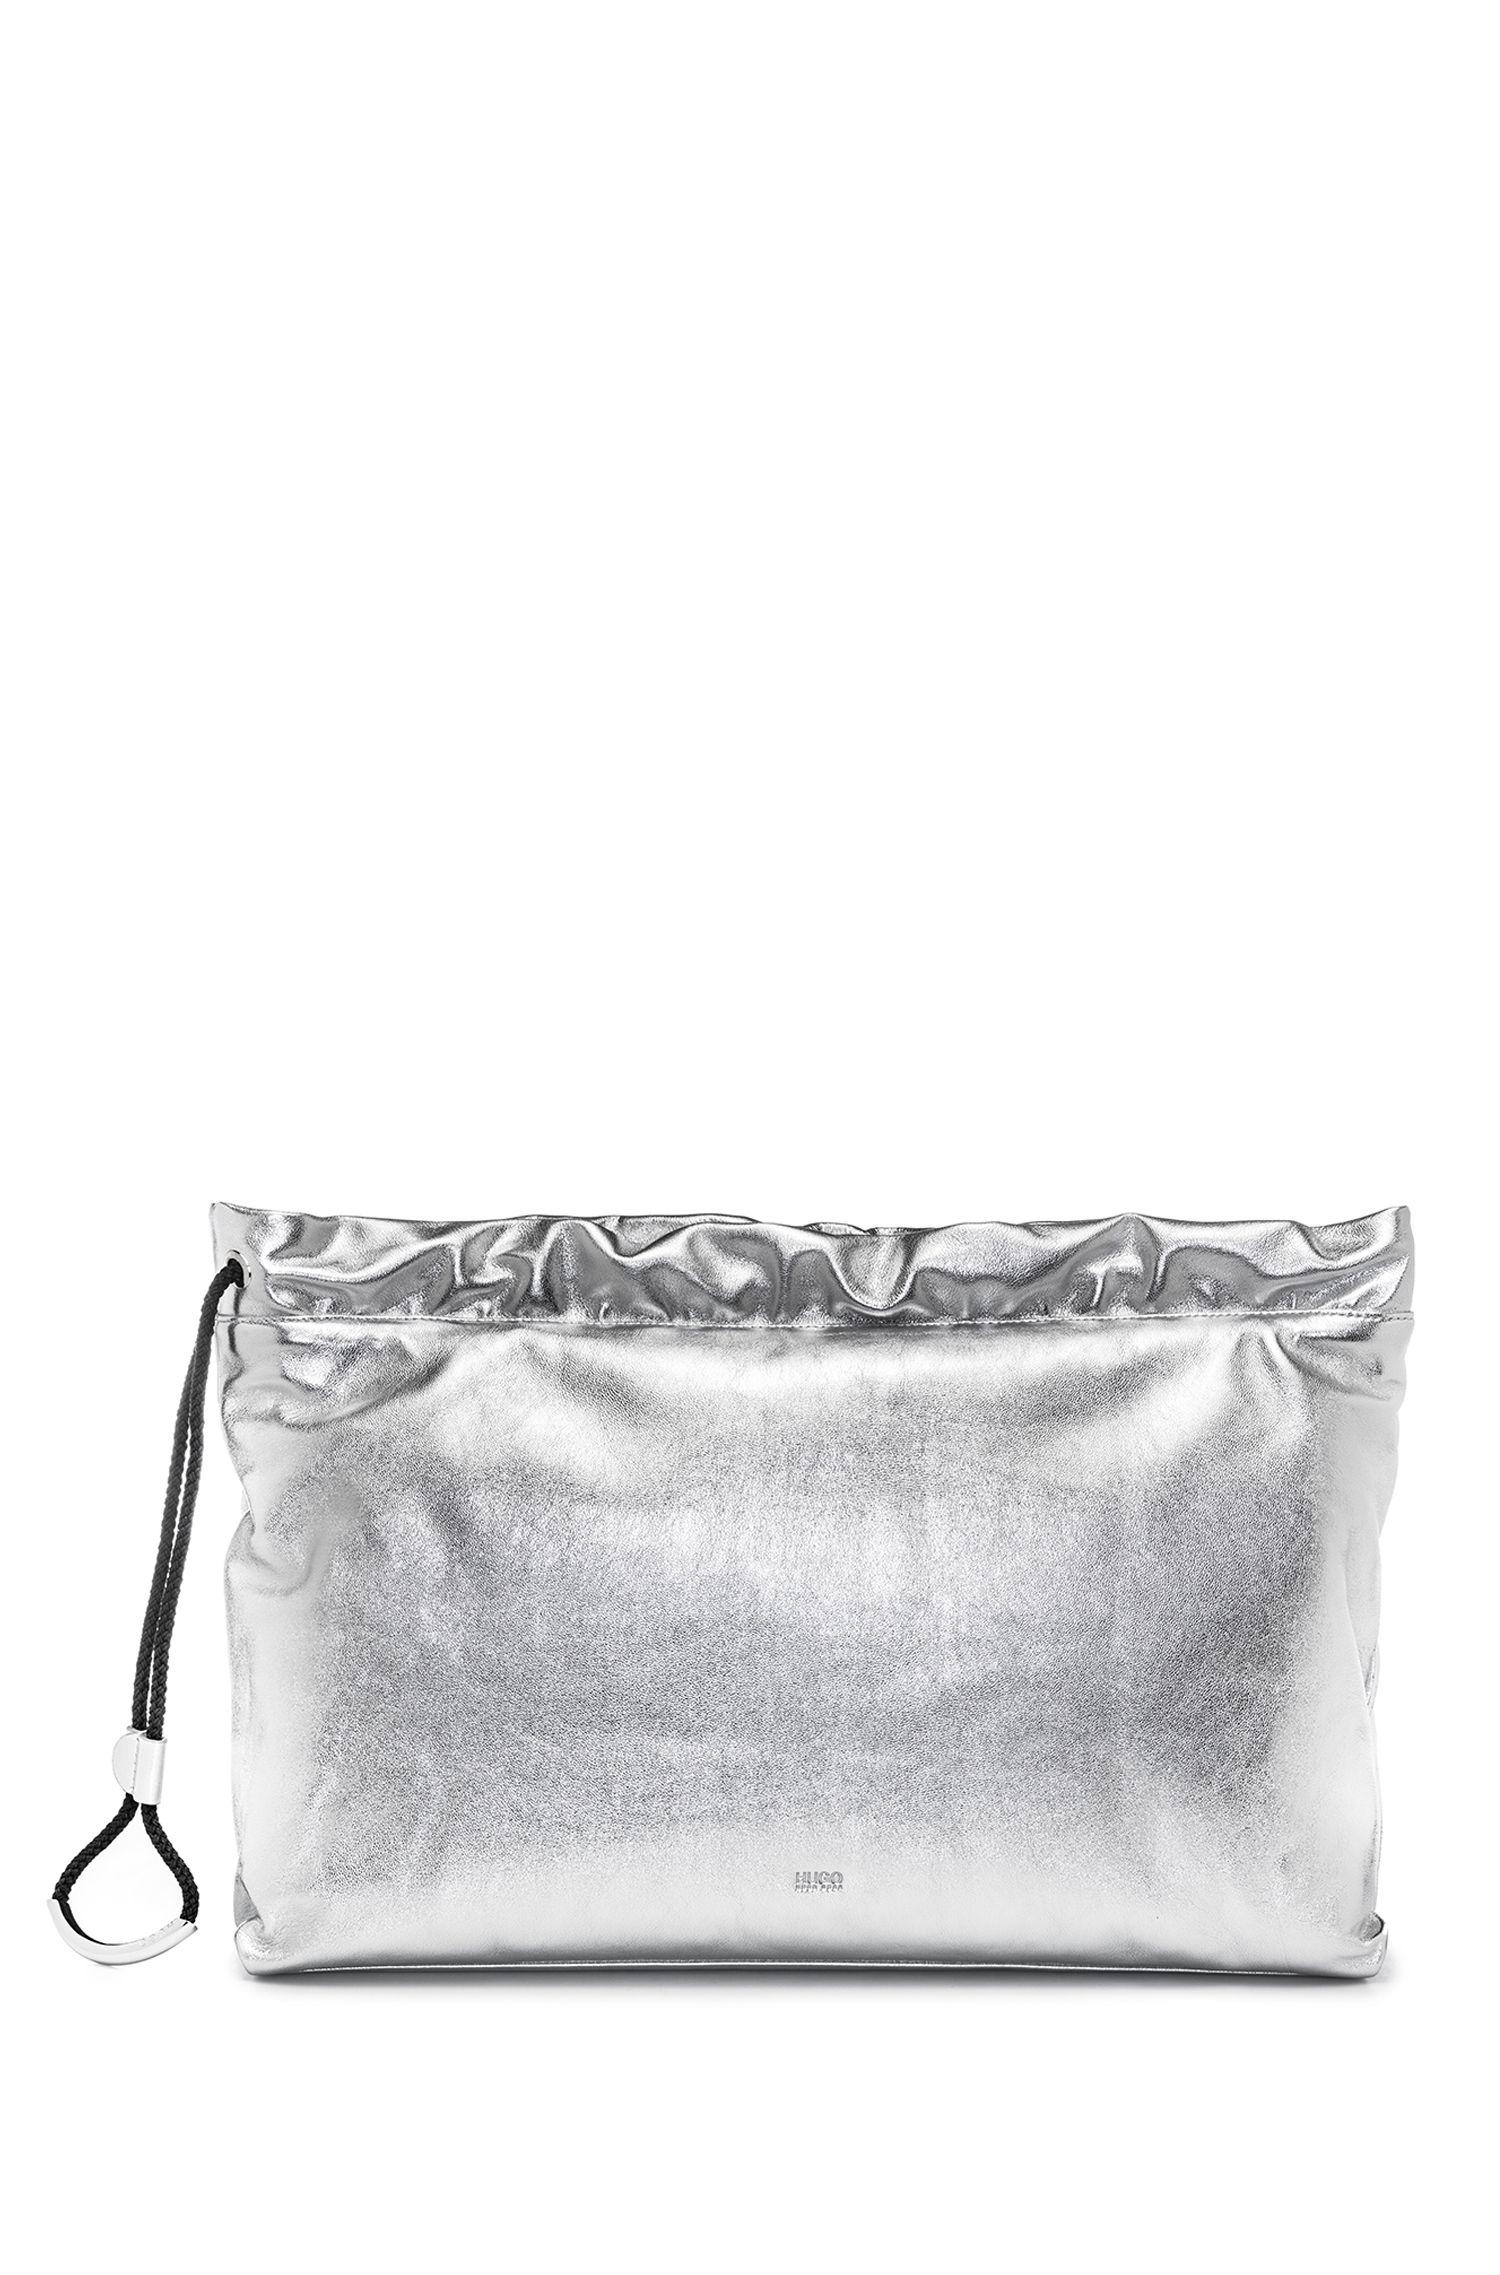 Pochette en cuir avec cordon de serrage